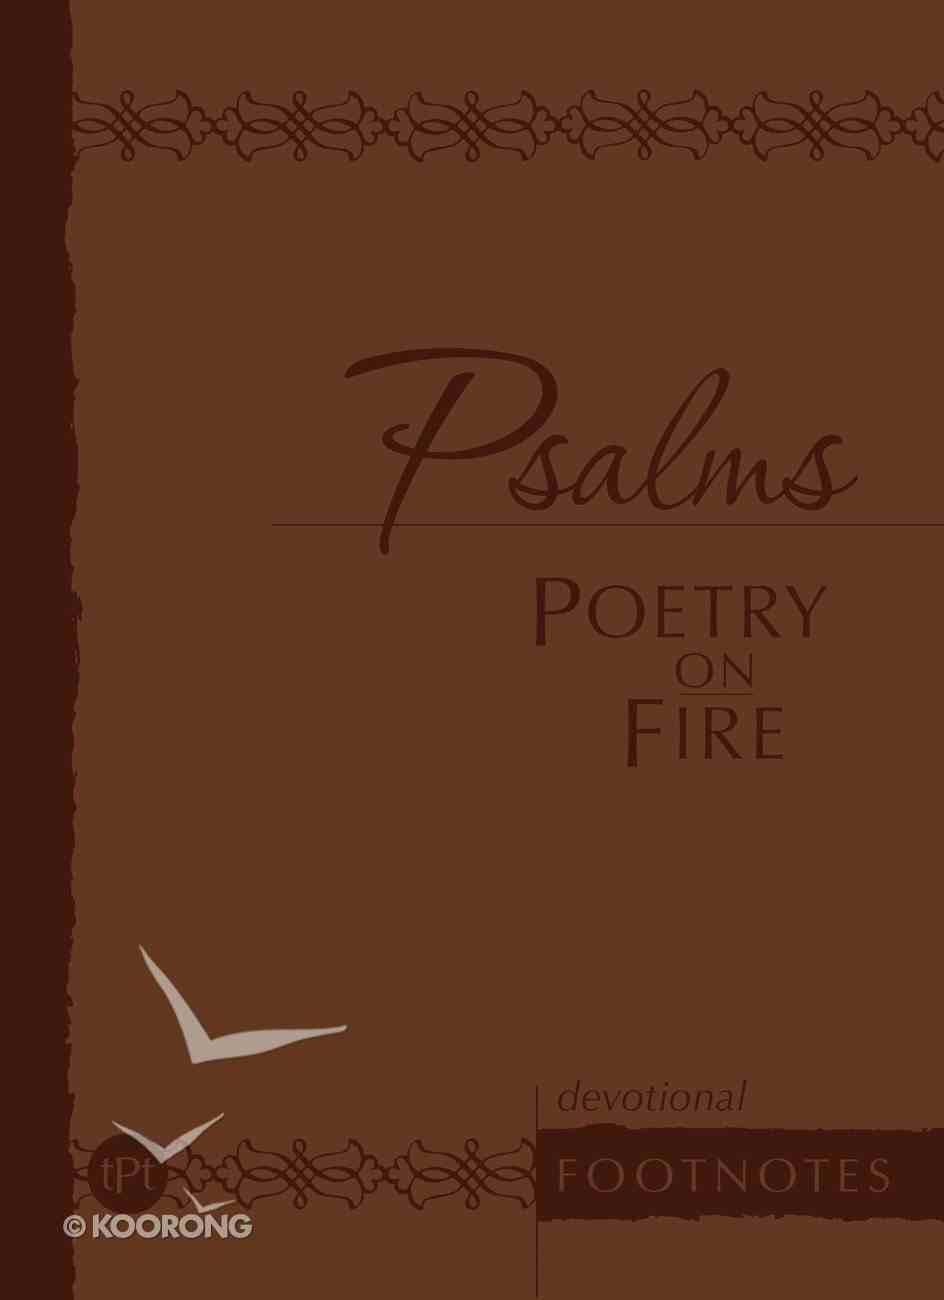 Psalms Poetry on Fire eBook